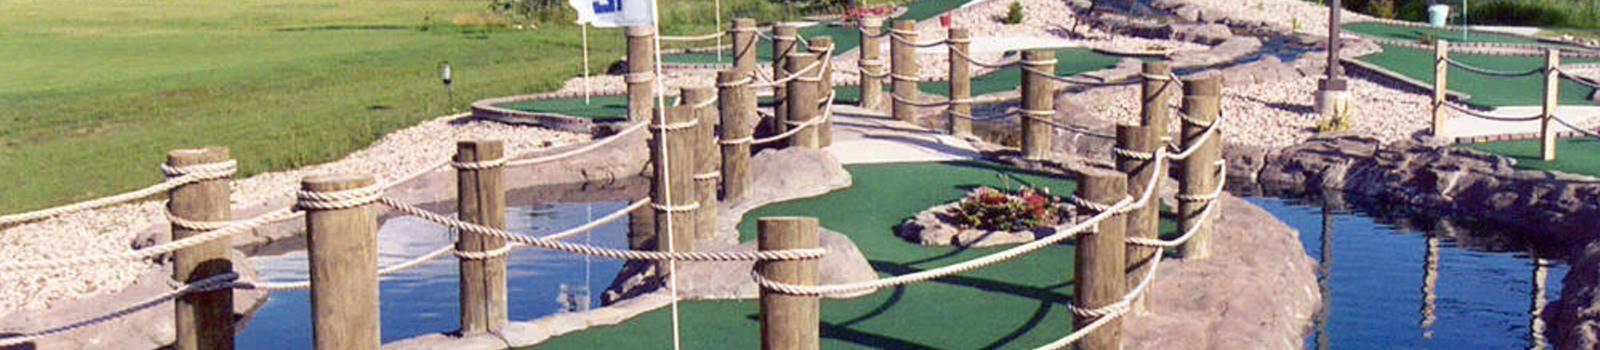 hole 7 mini golf course design